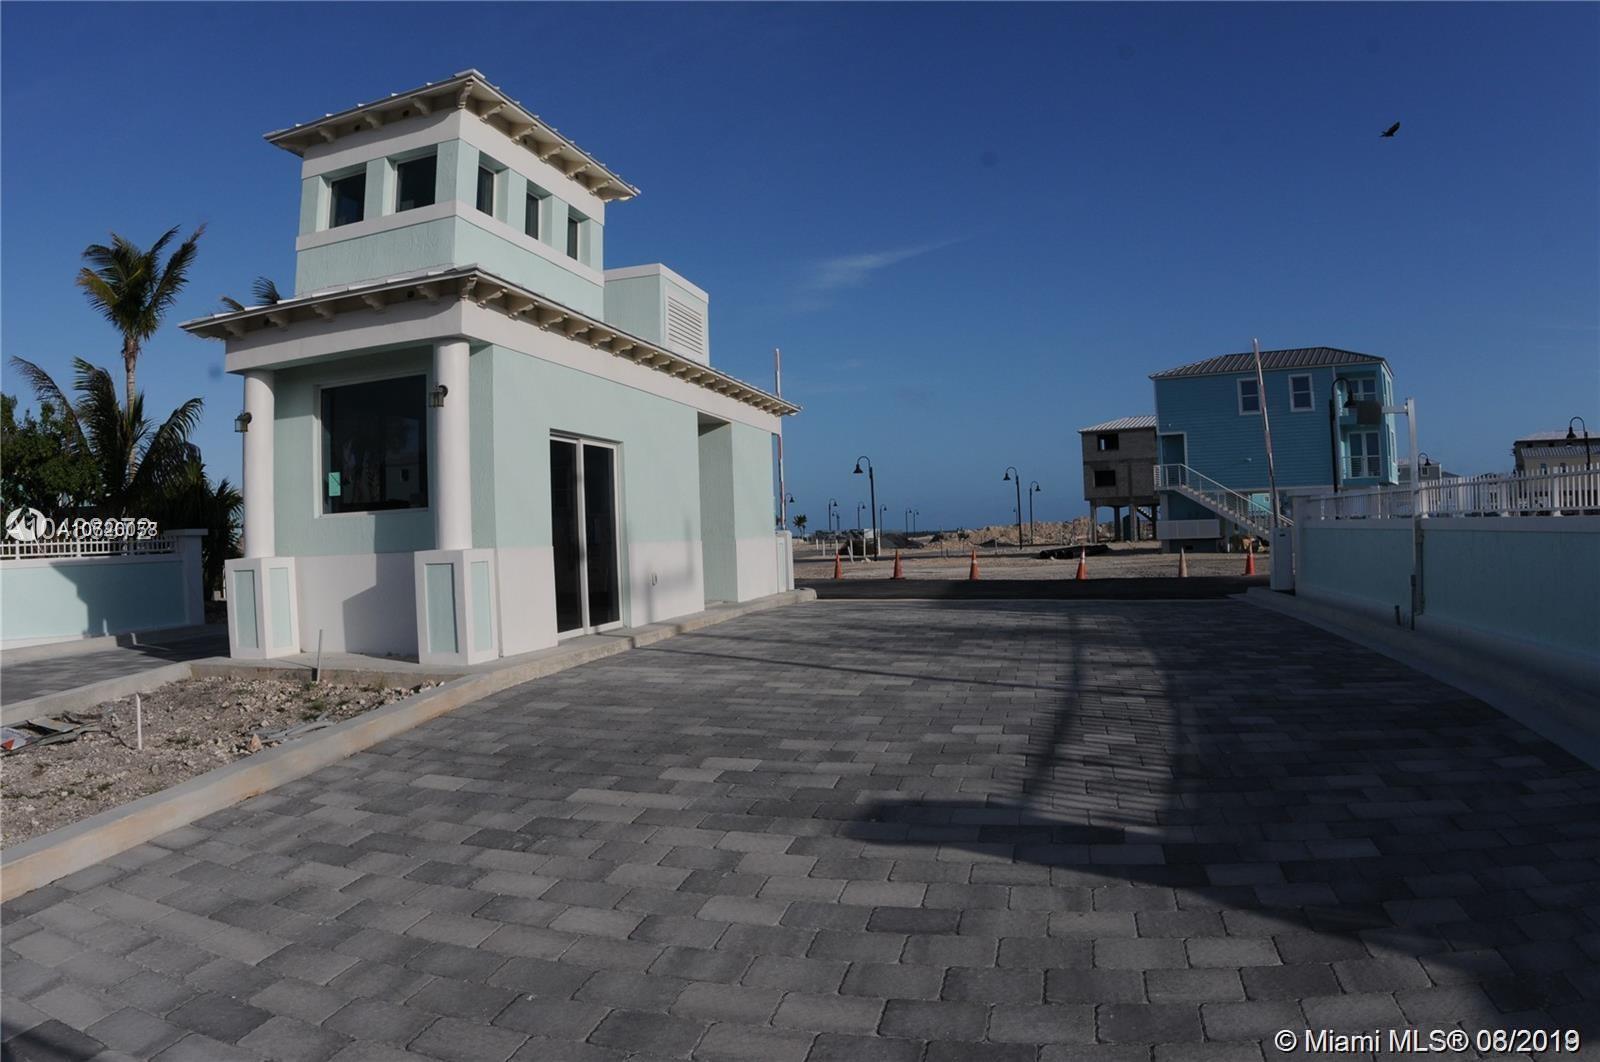 94825 Overseas Highway #96, Other City - Keys/Islands/Caribb, FL 33037 - Other City - Keys/Islands/Caribb, FL real estate listing